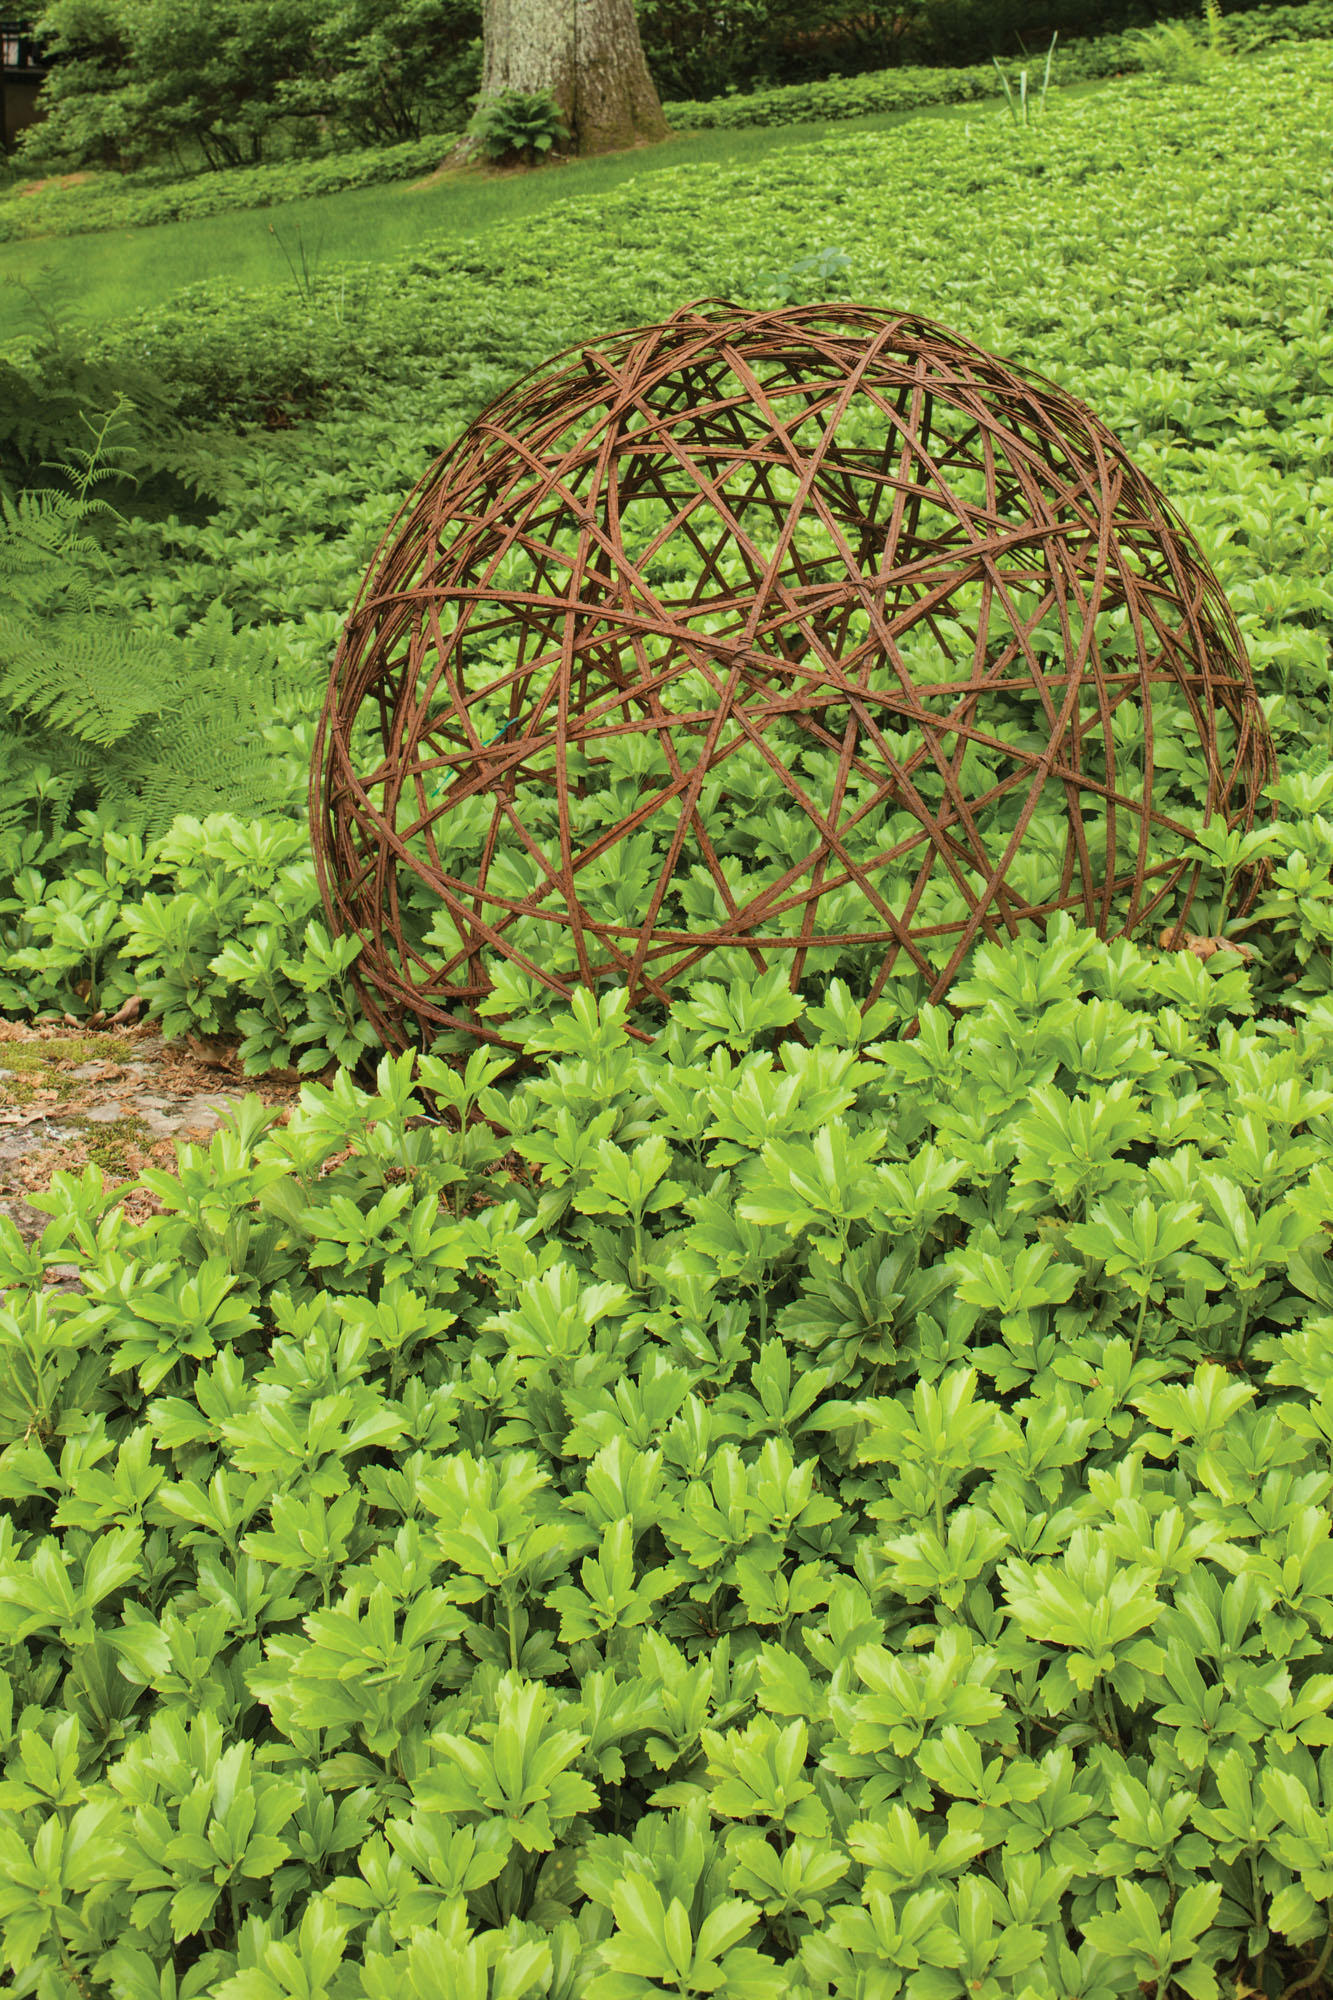 groundcover, metal ball sculpture